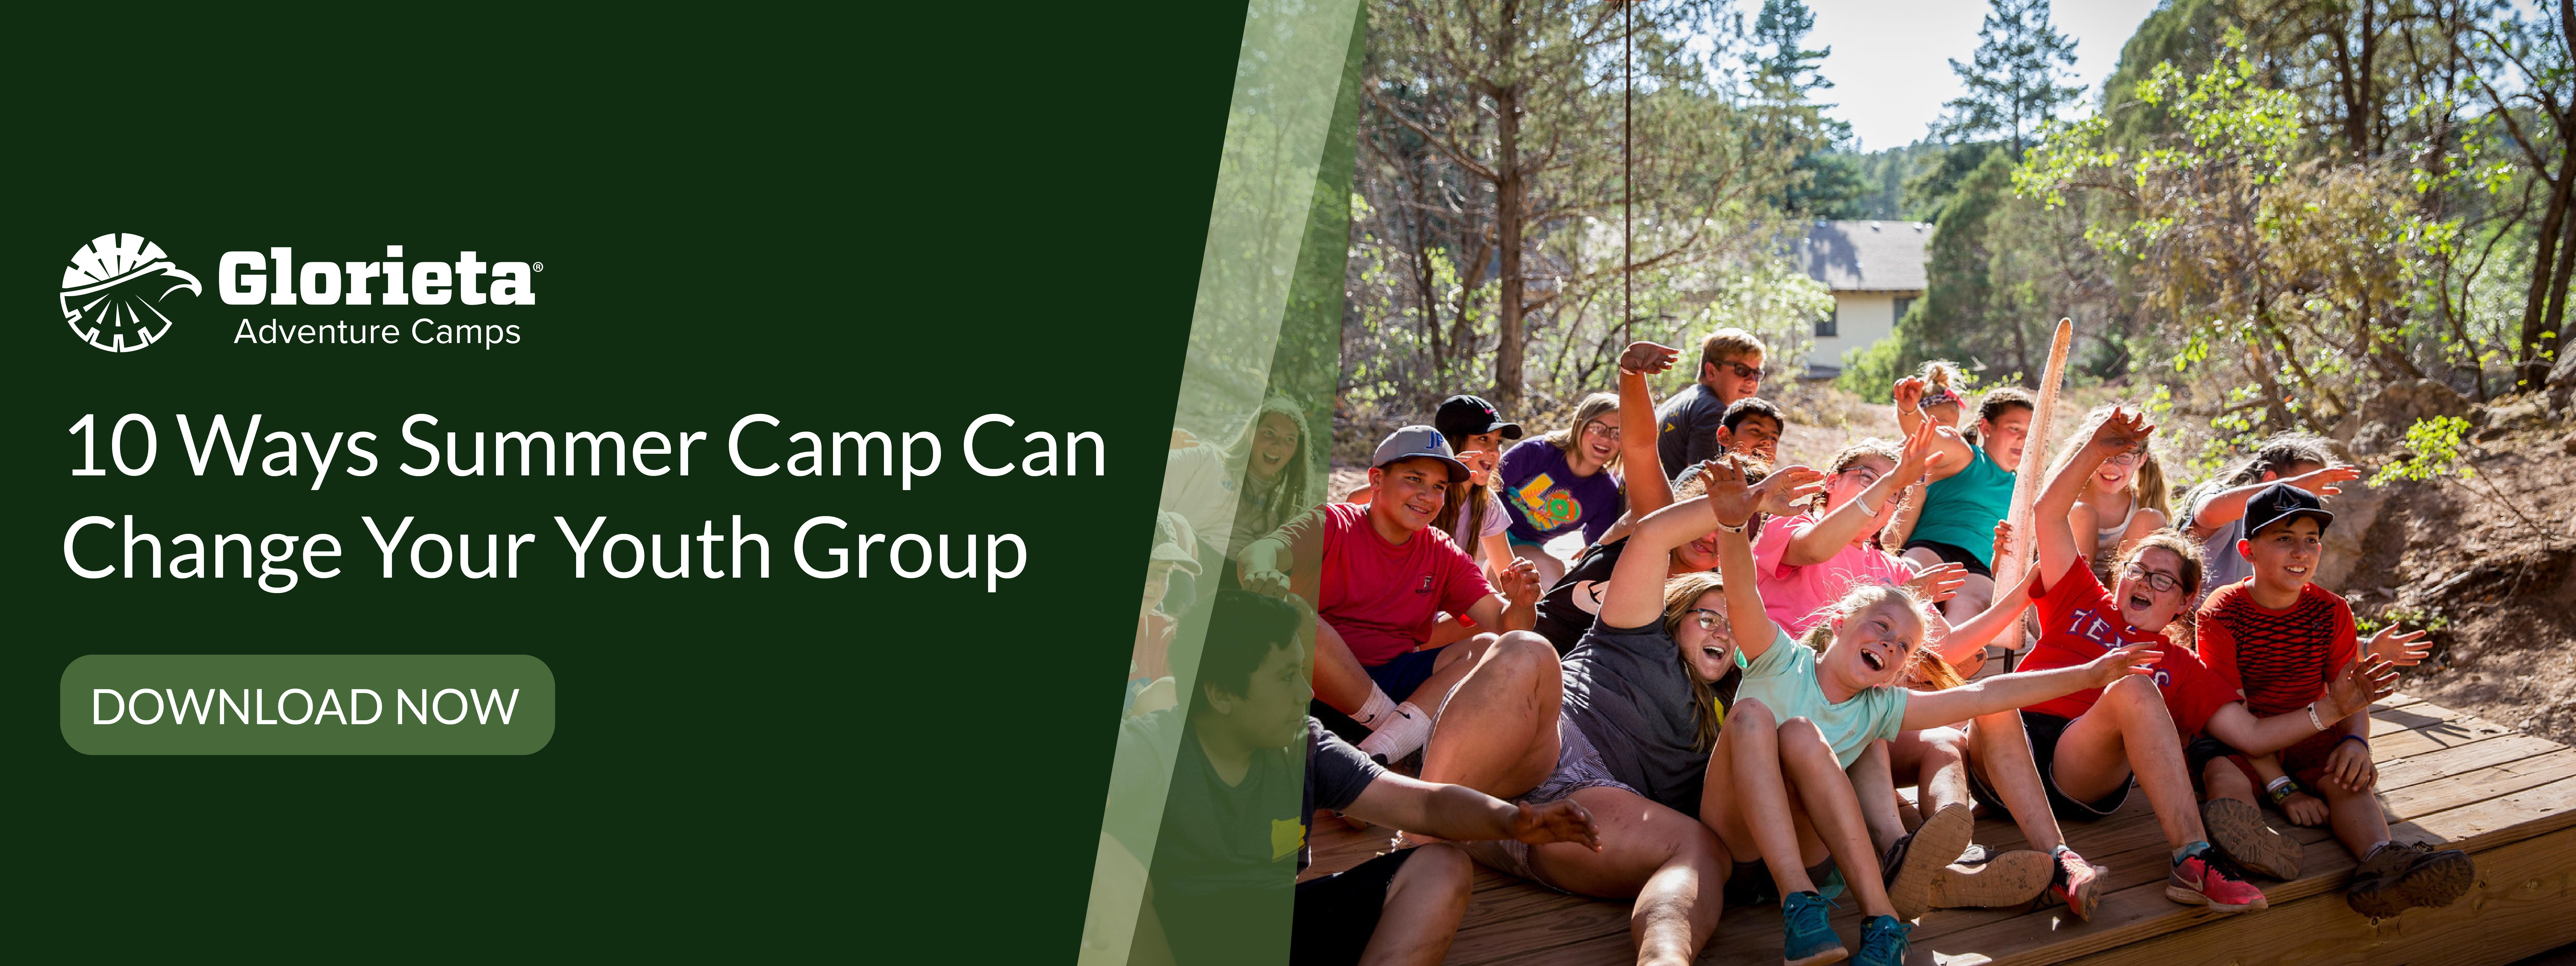 glorieta-group-camp